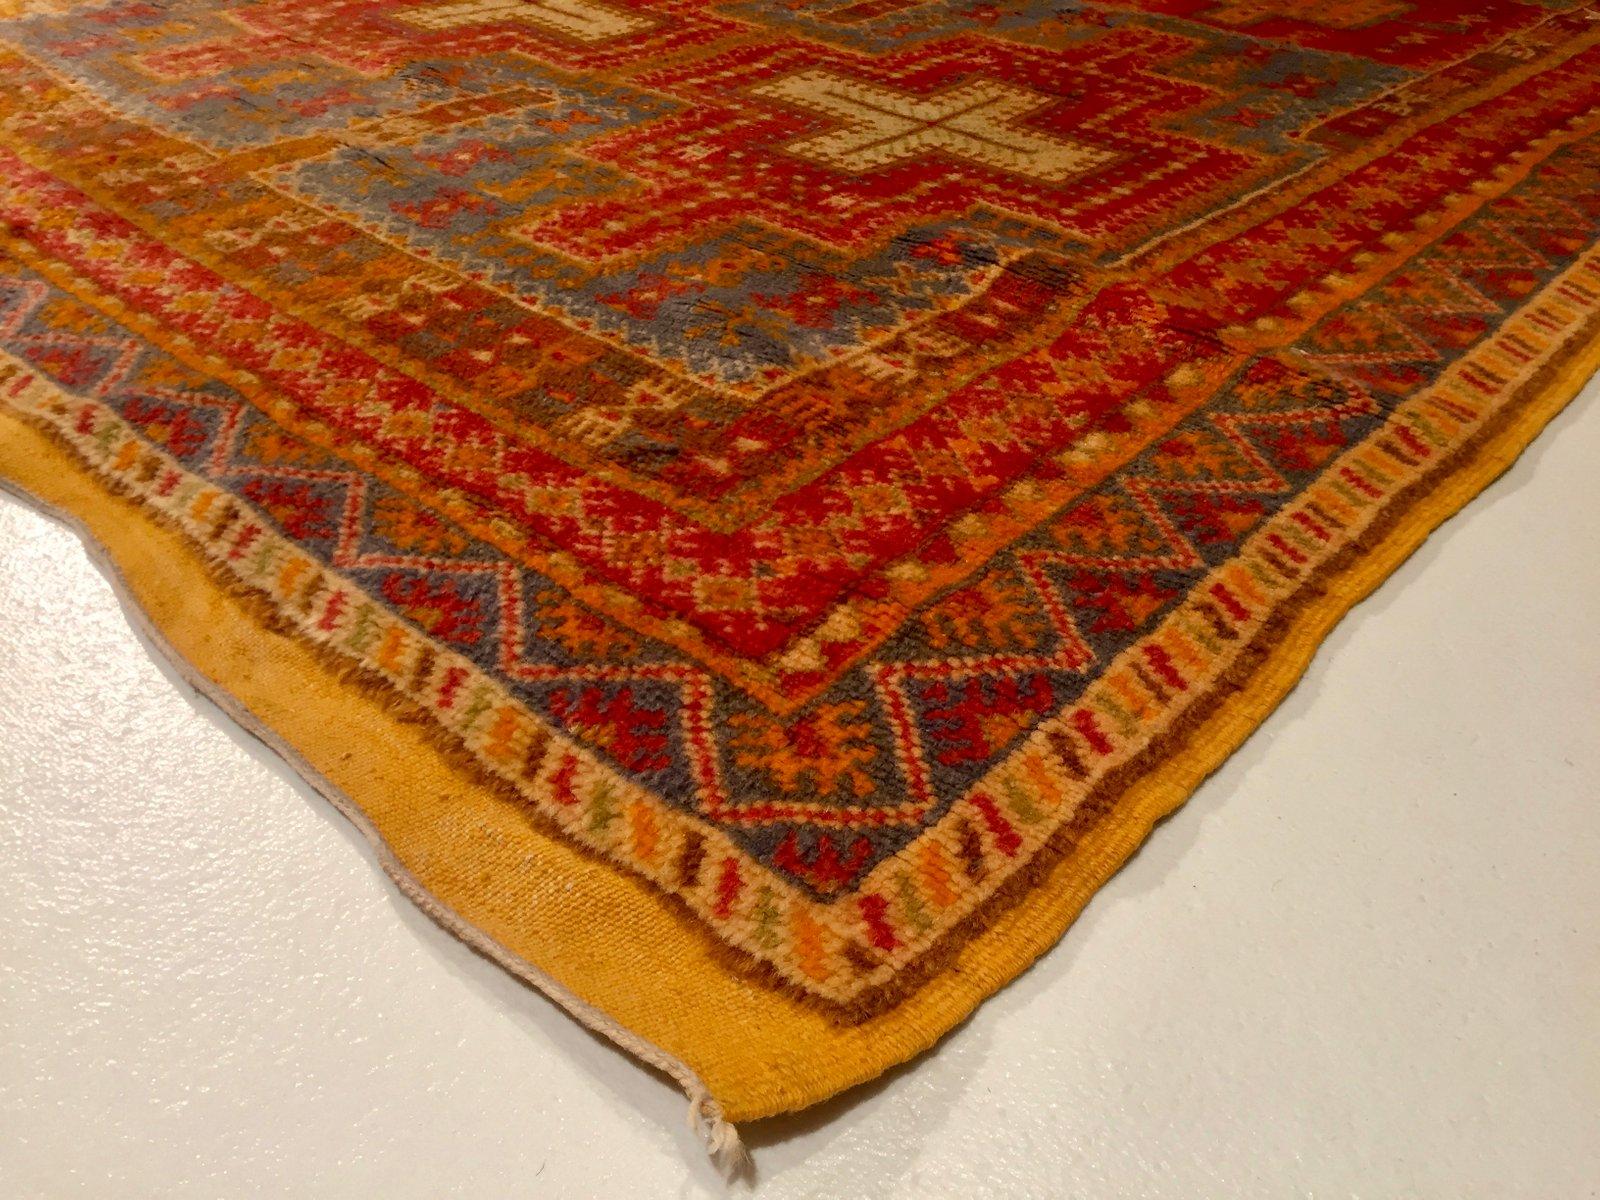 vintage berber teppich bei pamono kaufen. Black Bedroom Furniture Sets. Home Design Ideas